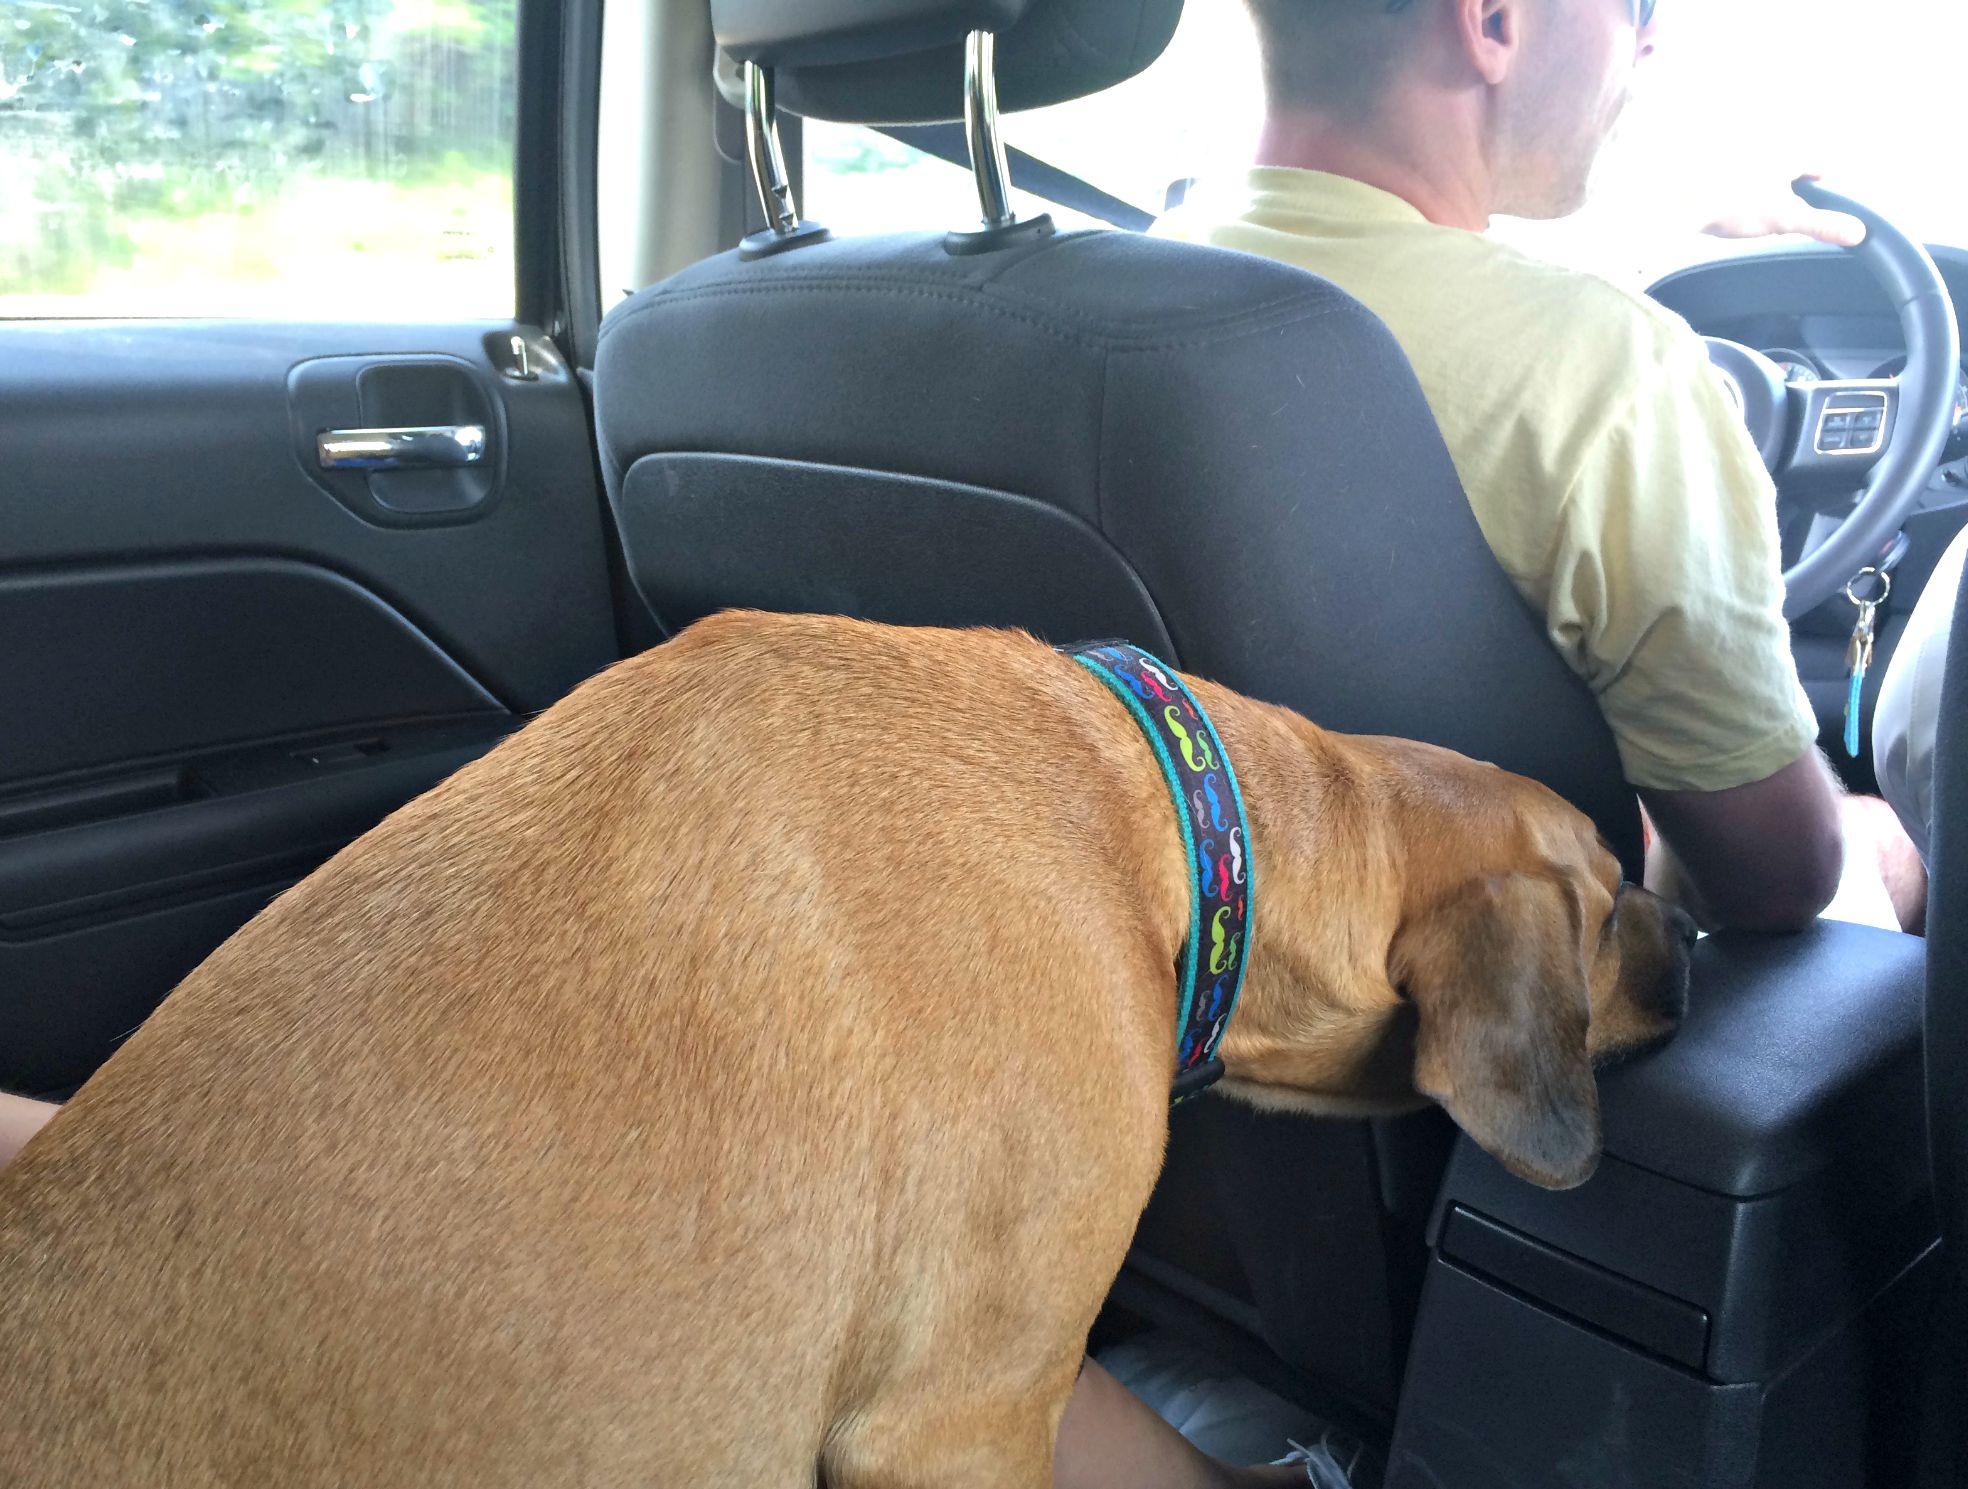 roadie being funny in the car